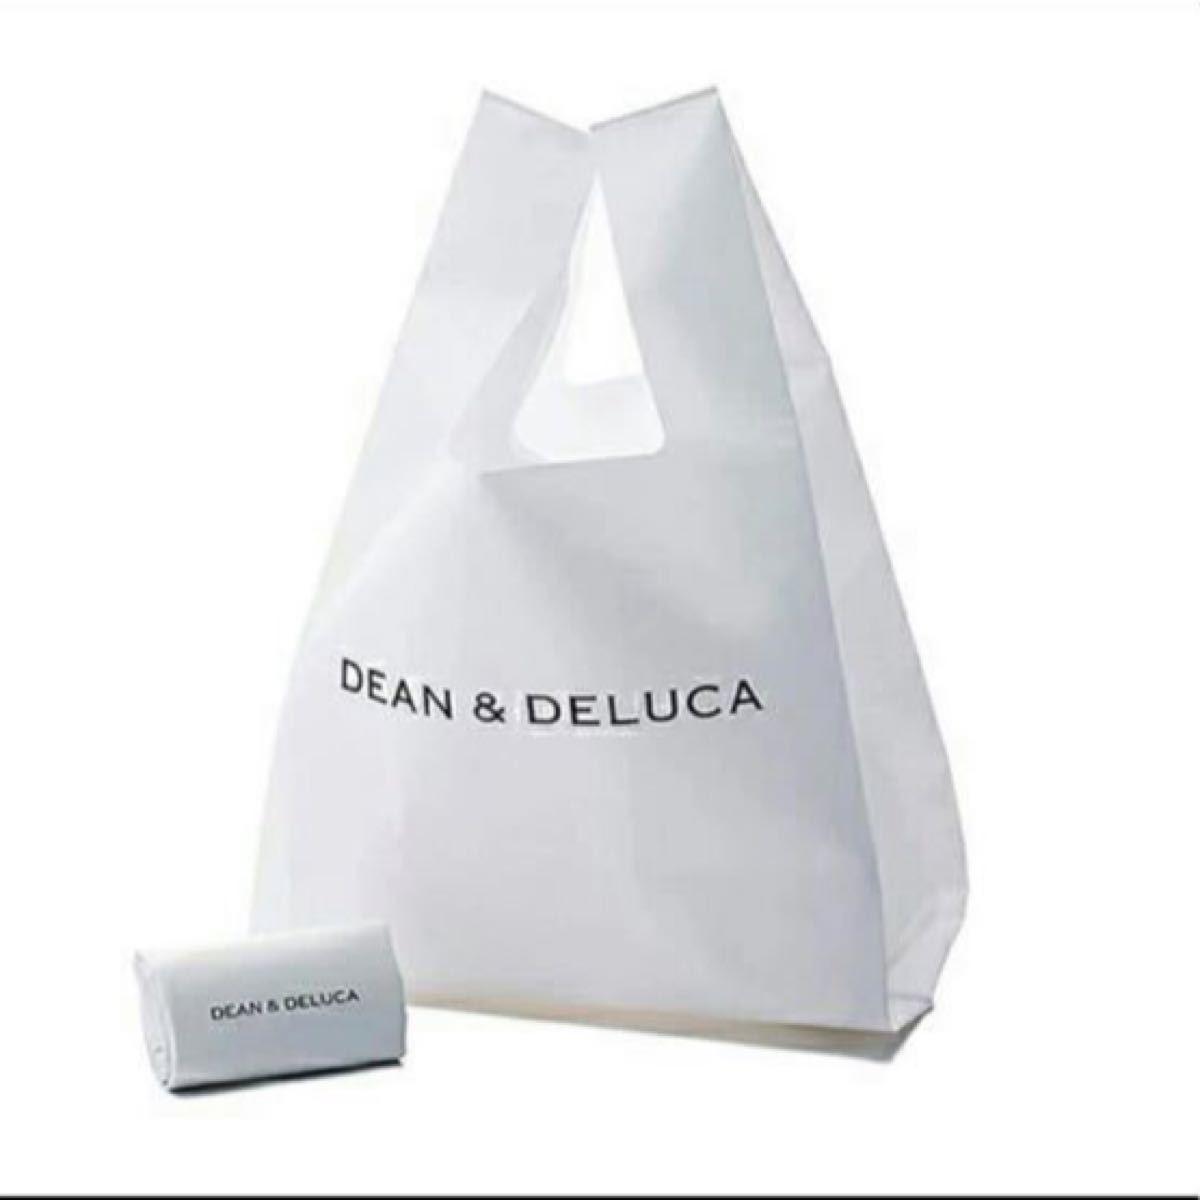 DEAN & DELUCA 3点セット トートバッグ クーラーバッグ エコバッグ